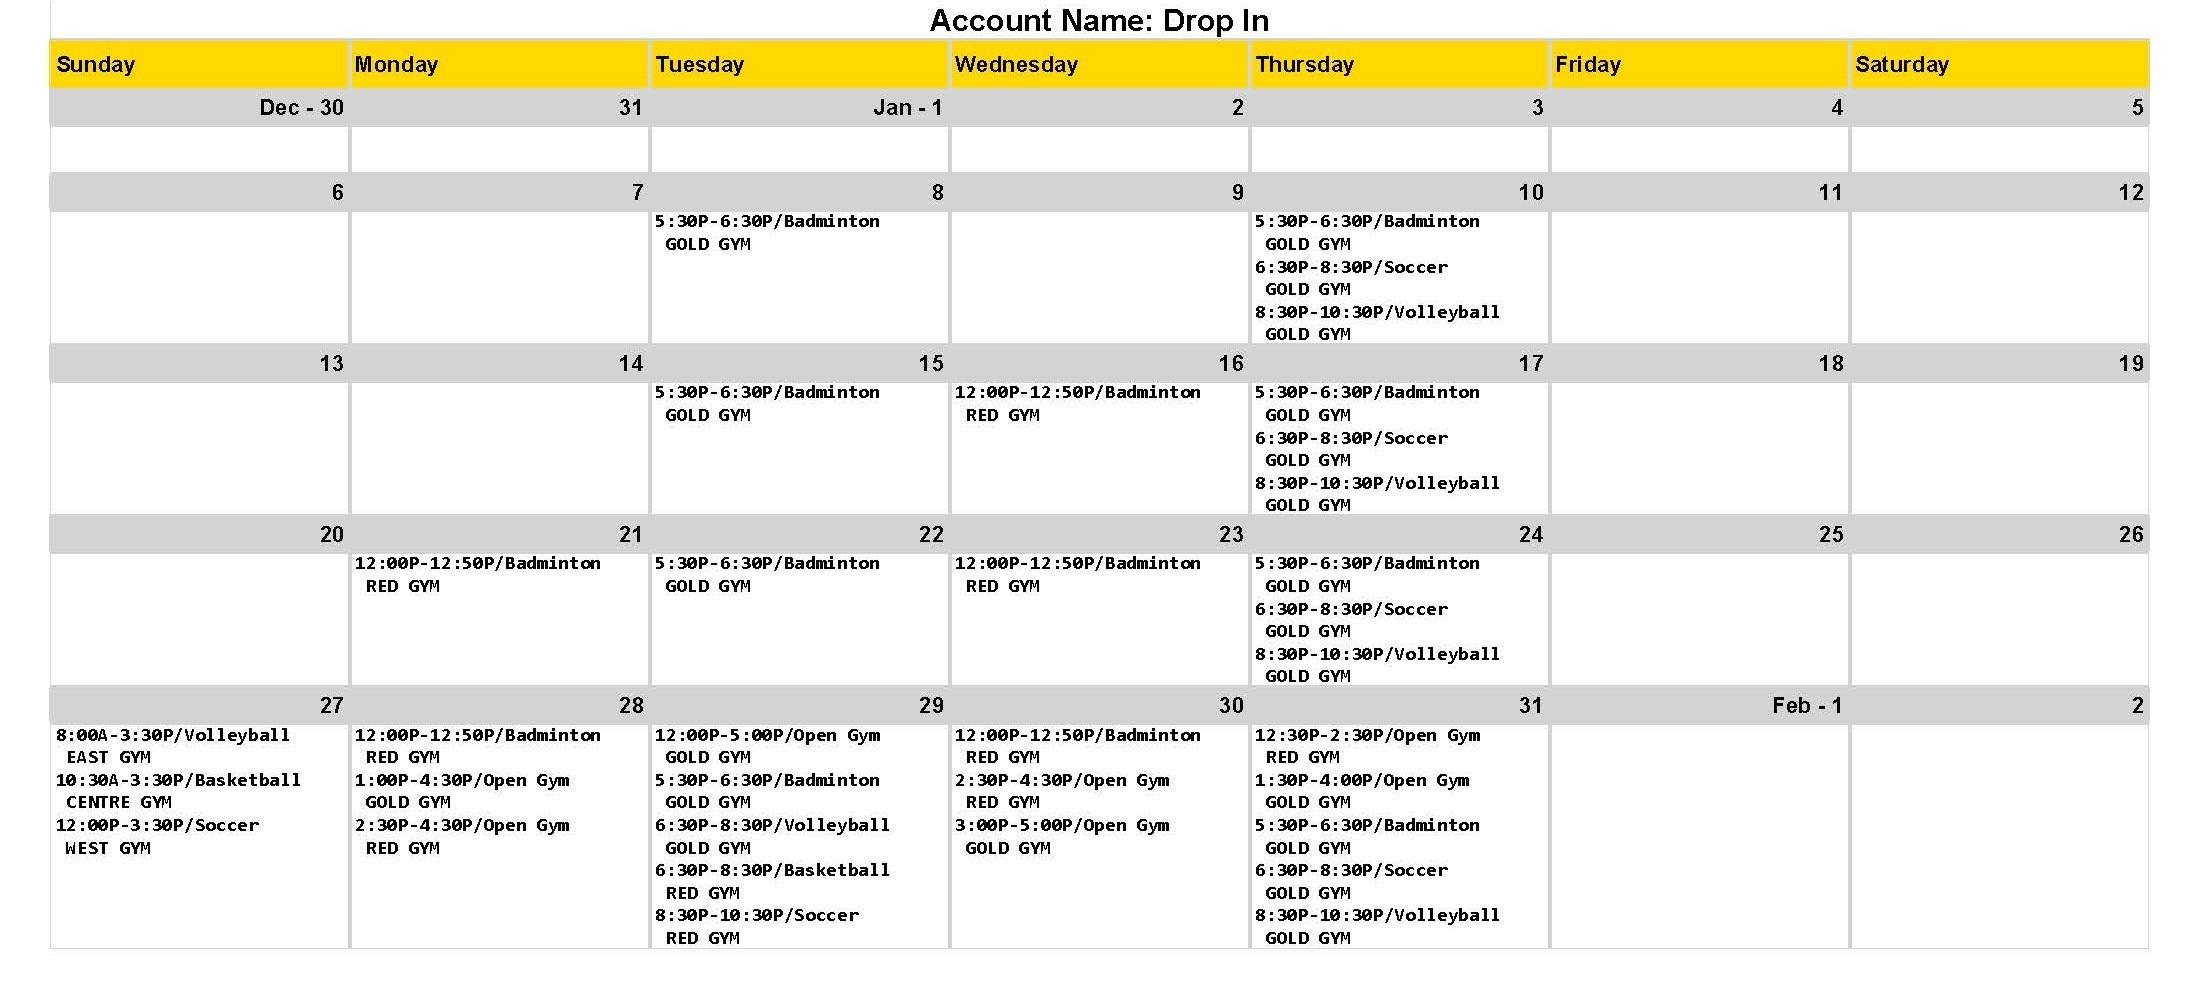 Drop in Gym Schedule